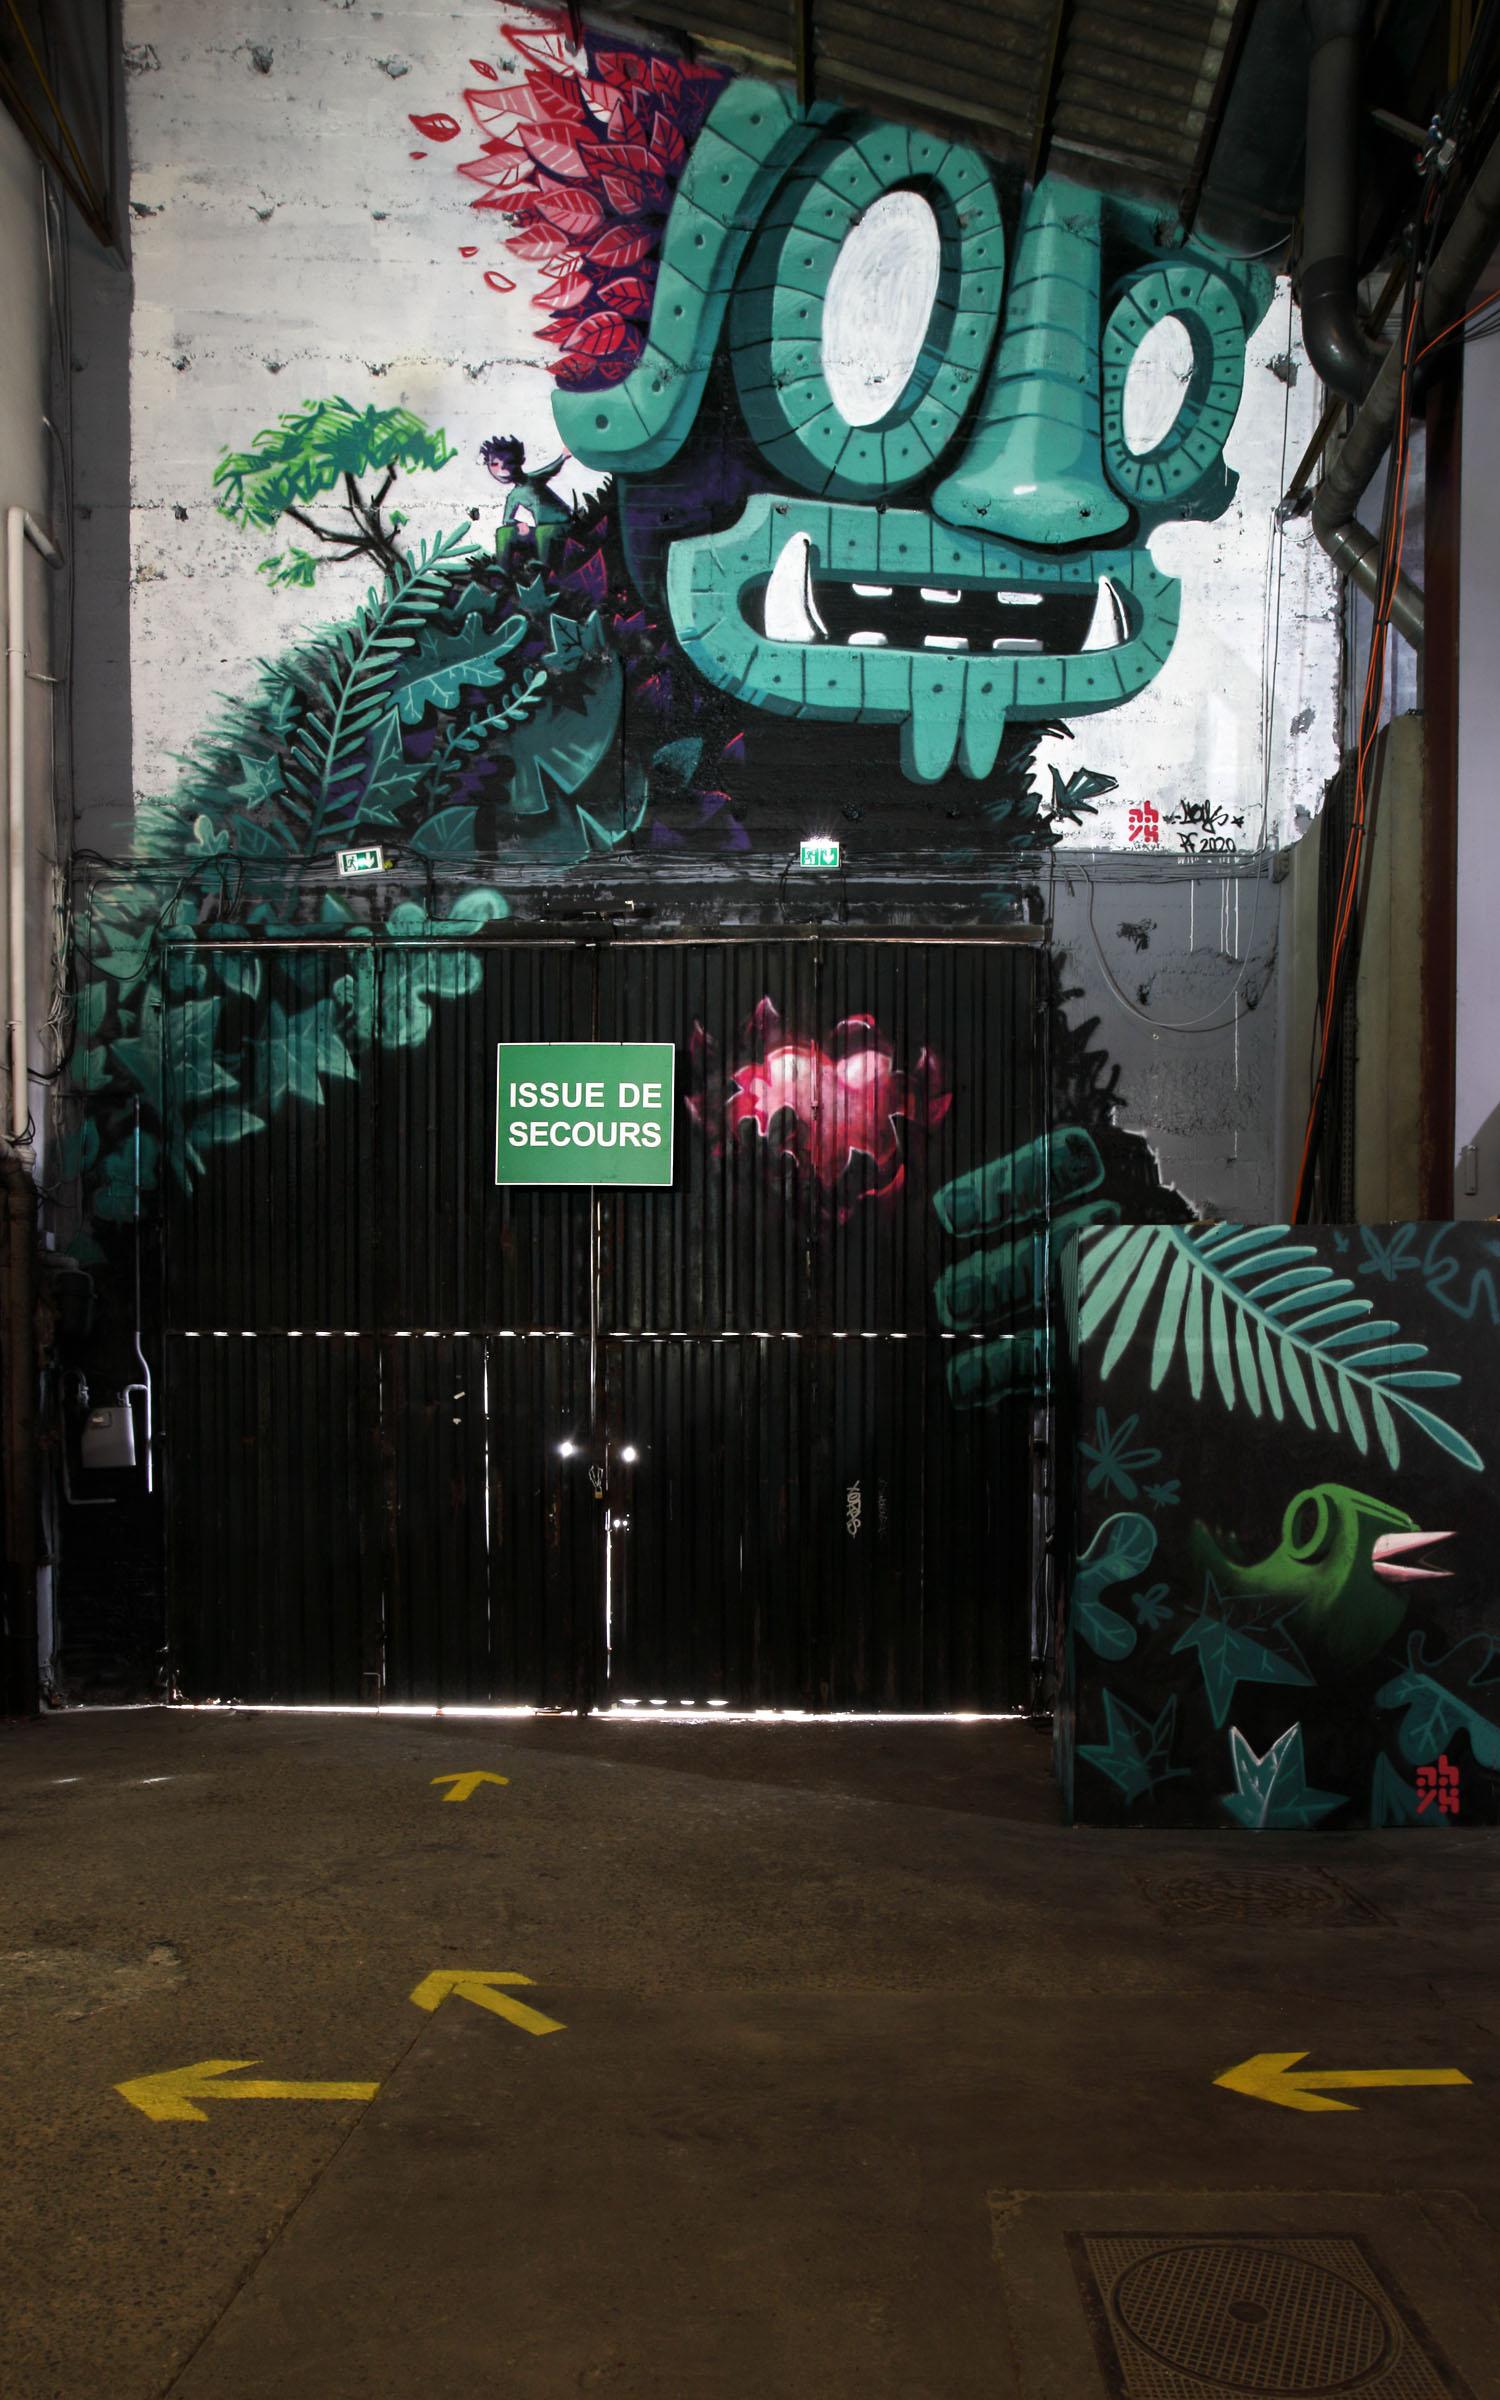 LHH-Peinture-Fraiche-Festival-2020-Abys-2-Fly-titan-de-jade